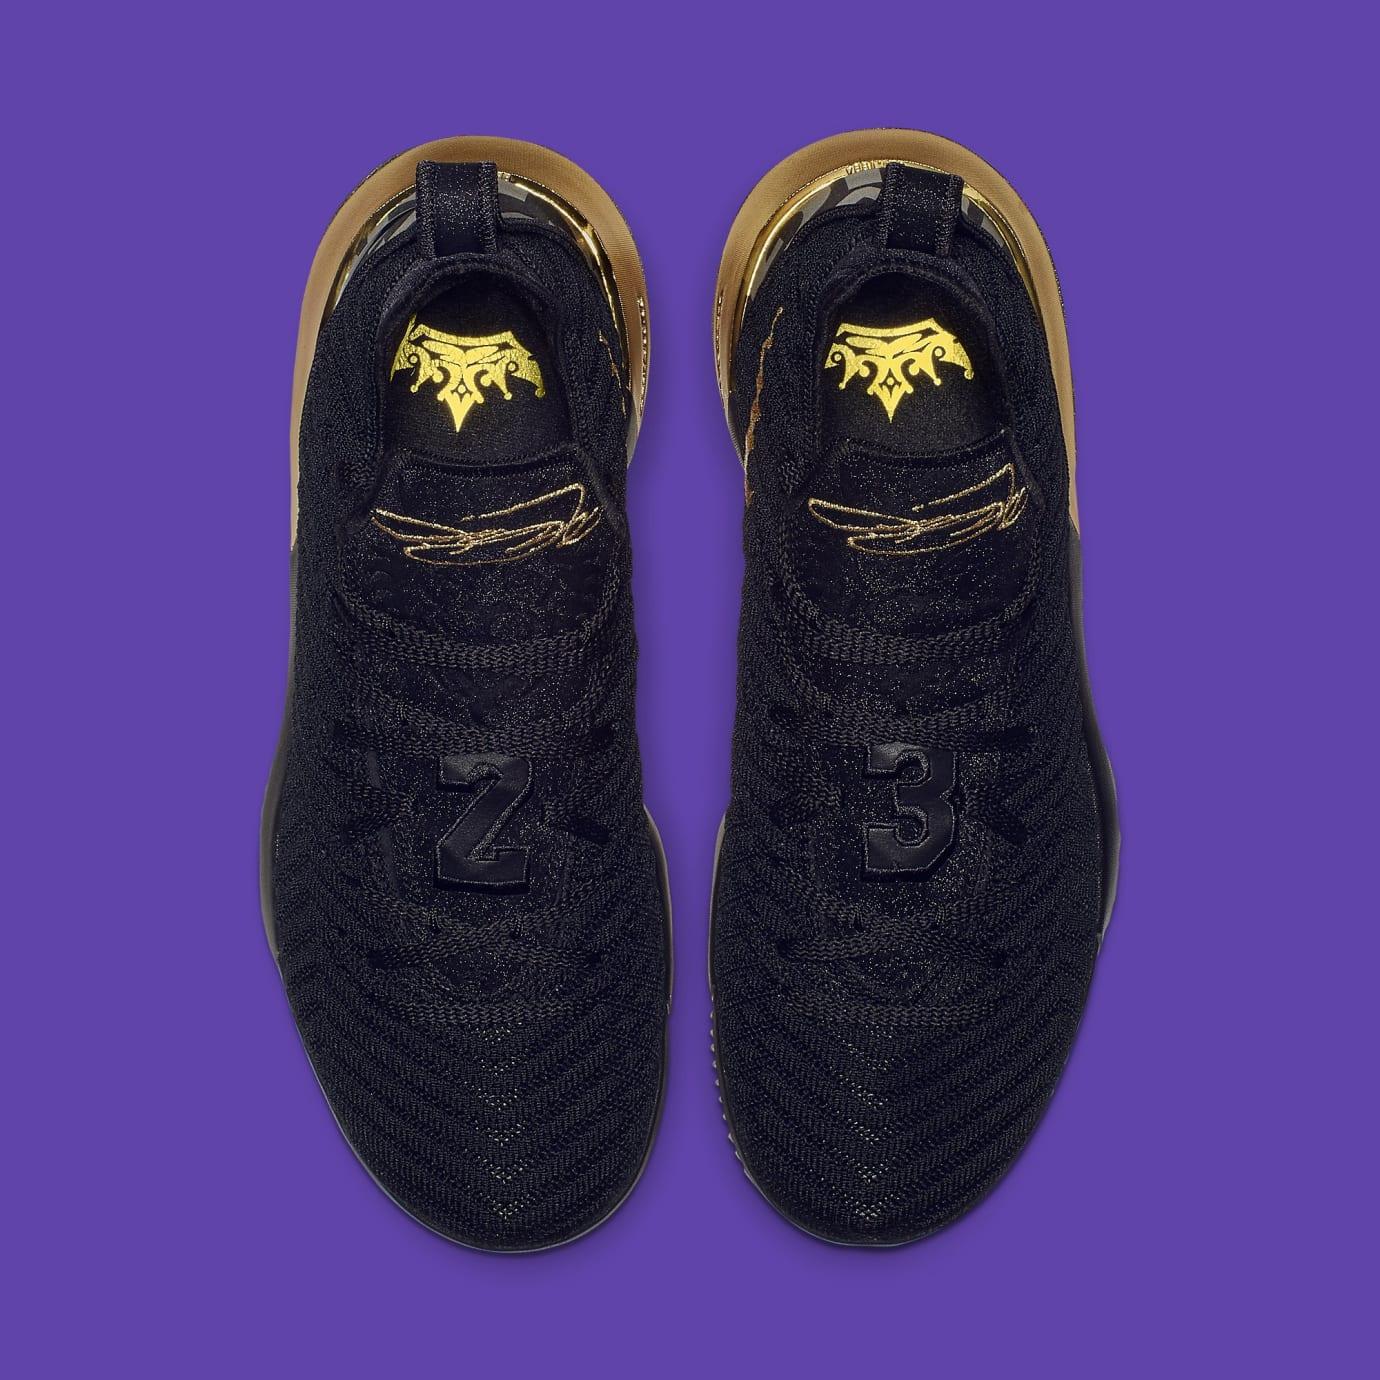 new concept 6b761 3fb1e Image via Nike Nike LeBron 16 XVI I m King Release Date BQ5970-007 Top